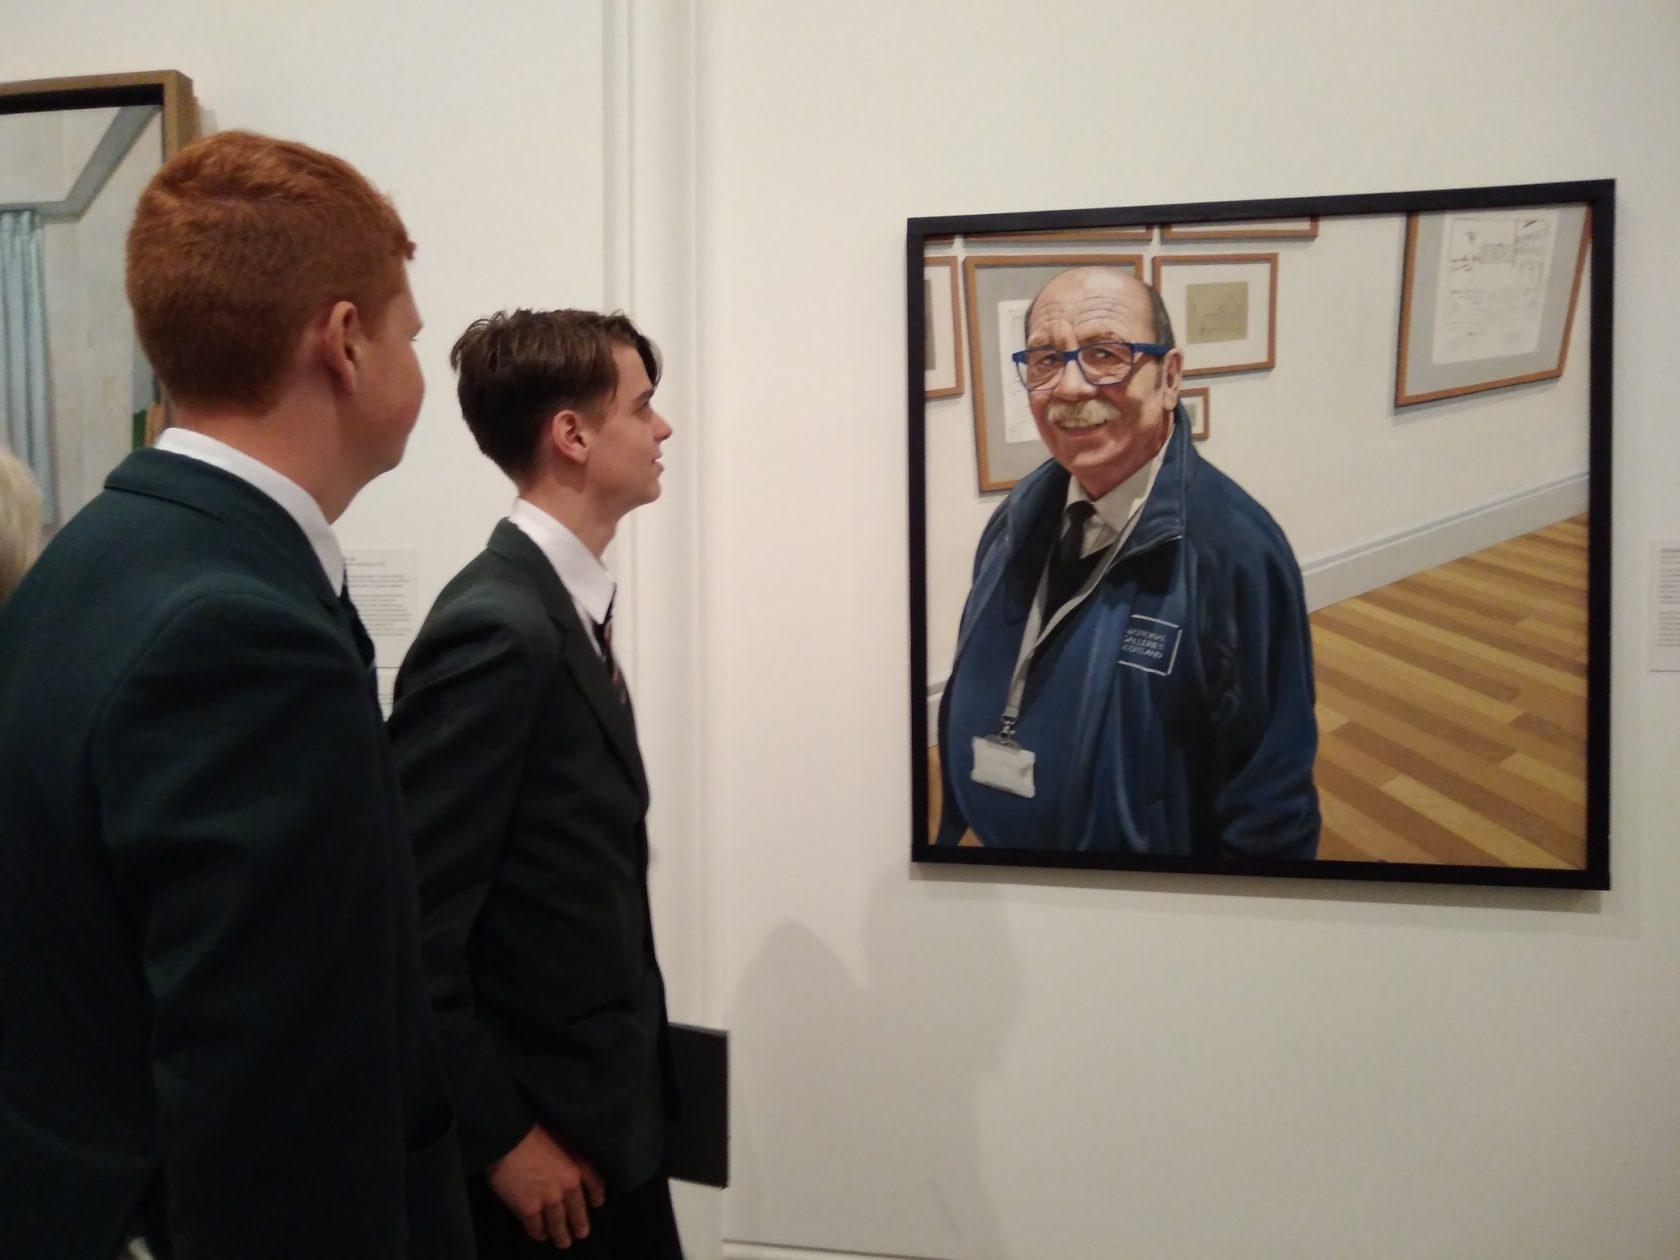 National Portrait Gallery Trip